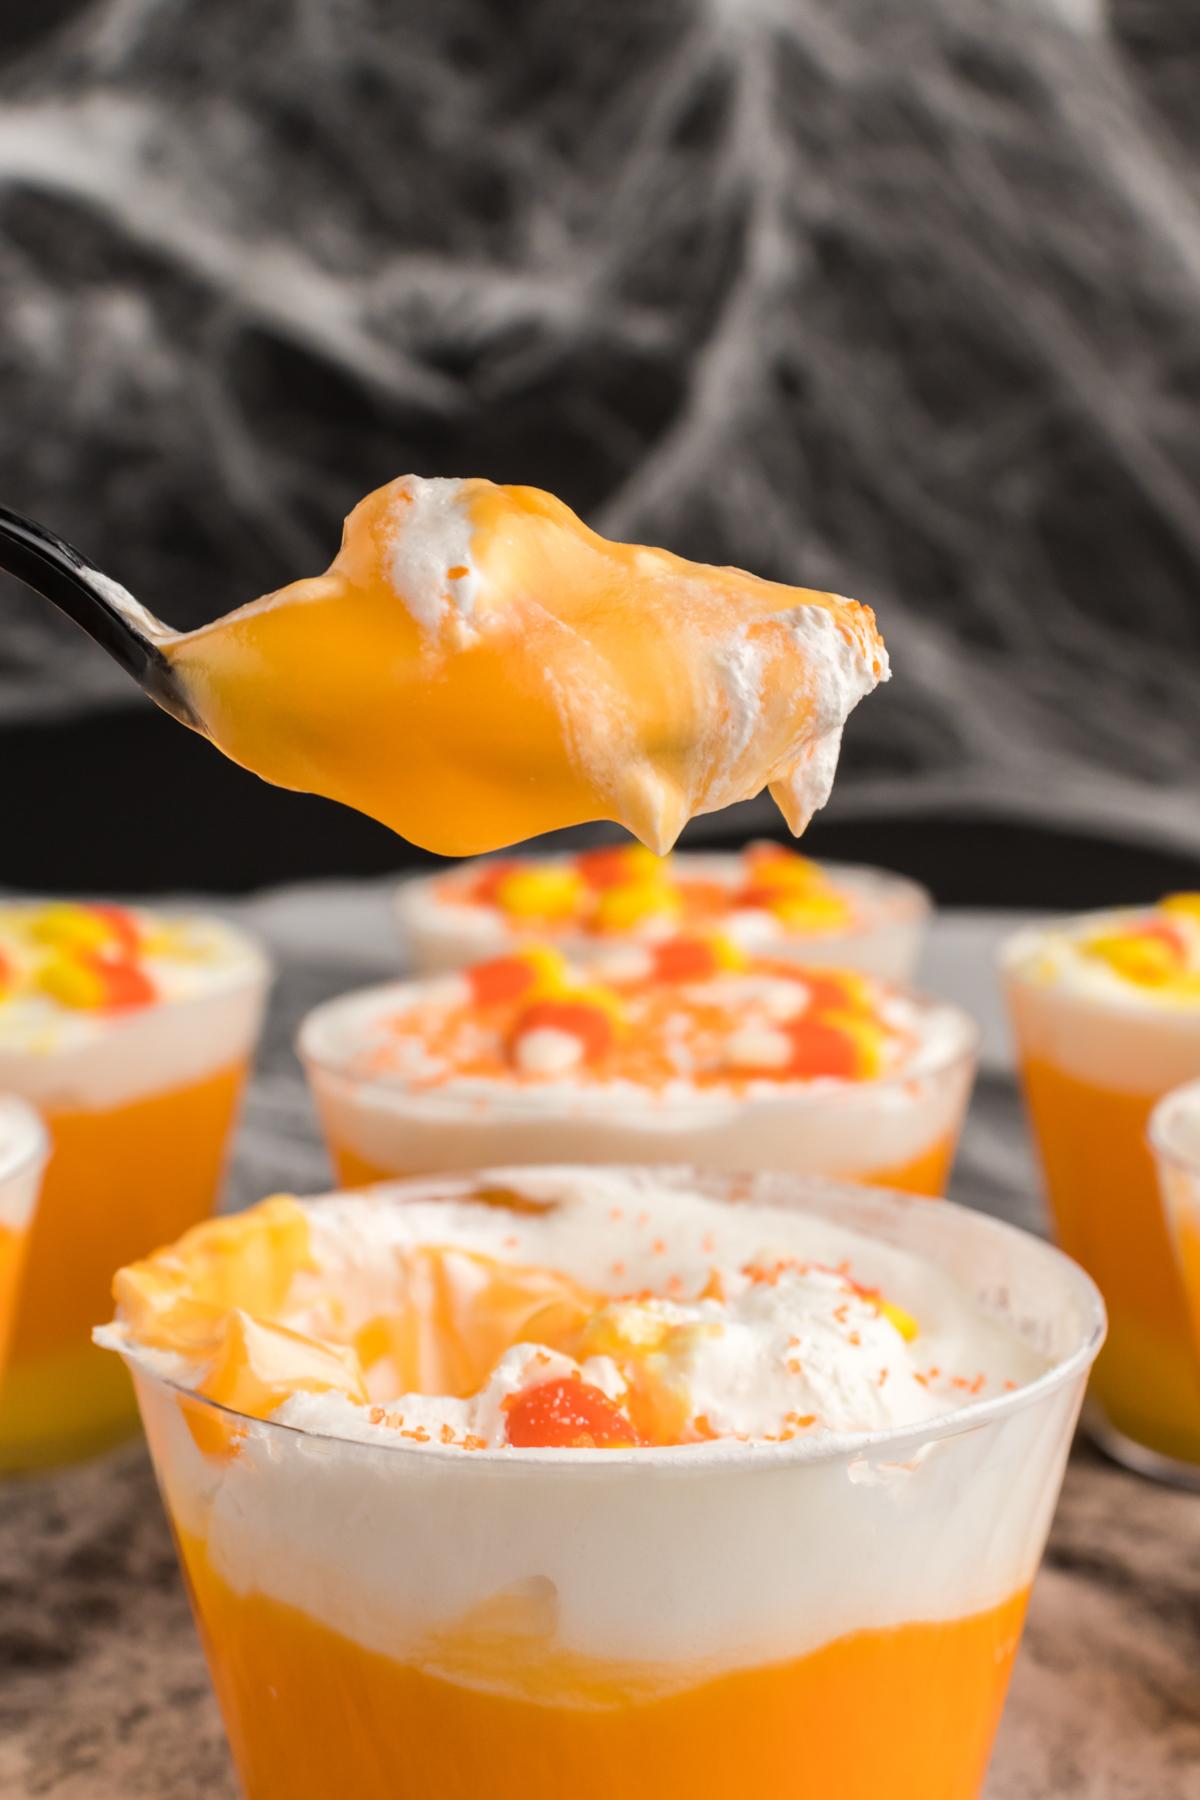 spoon full of orange pudding